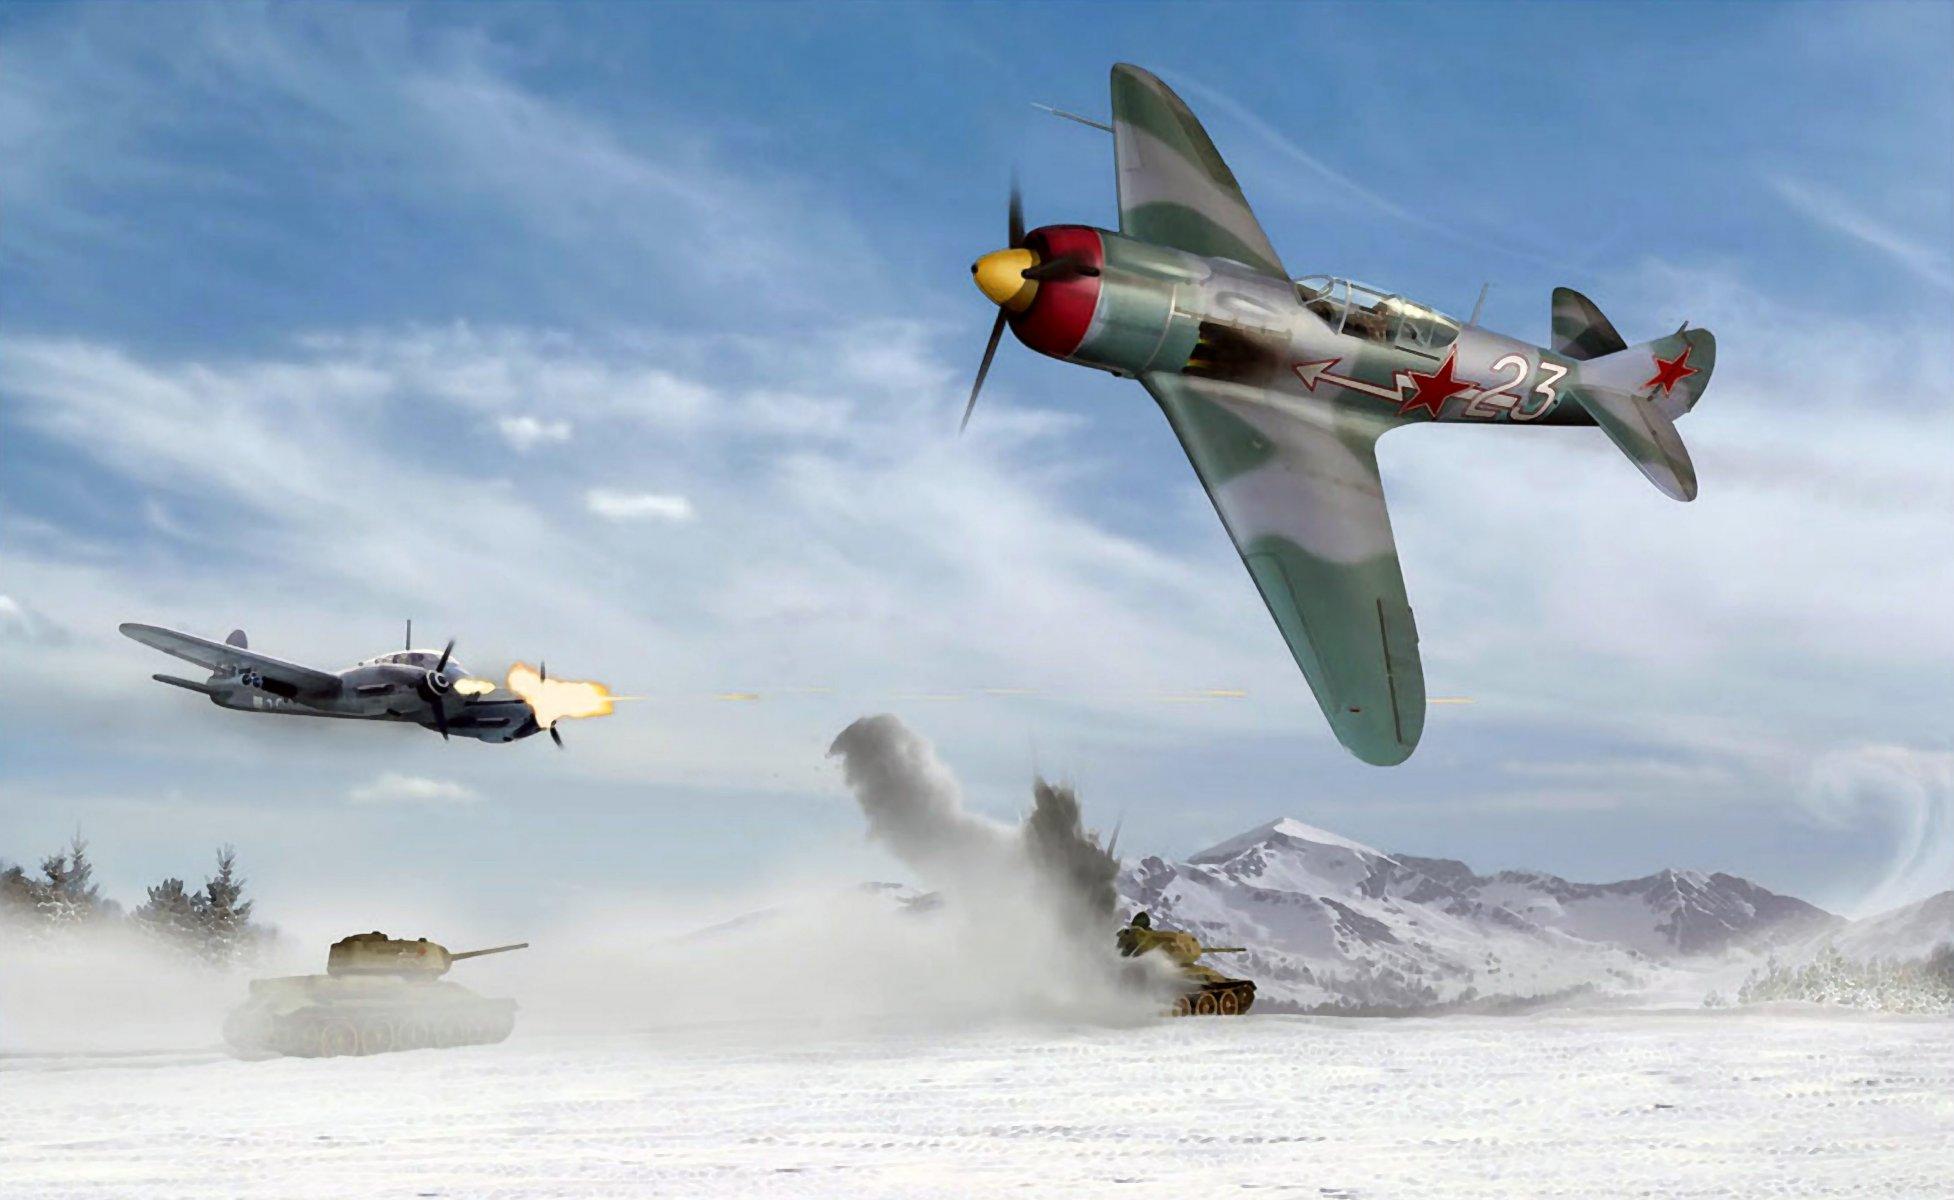 Обои земля, Облака, битва, самолеты, война. Авиация foto 16